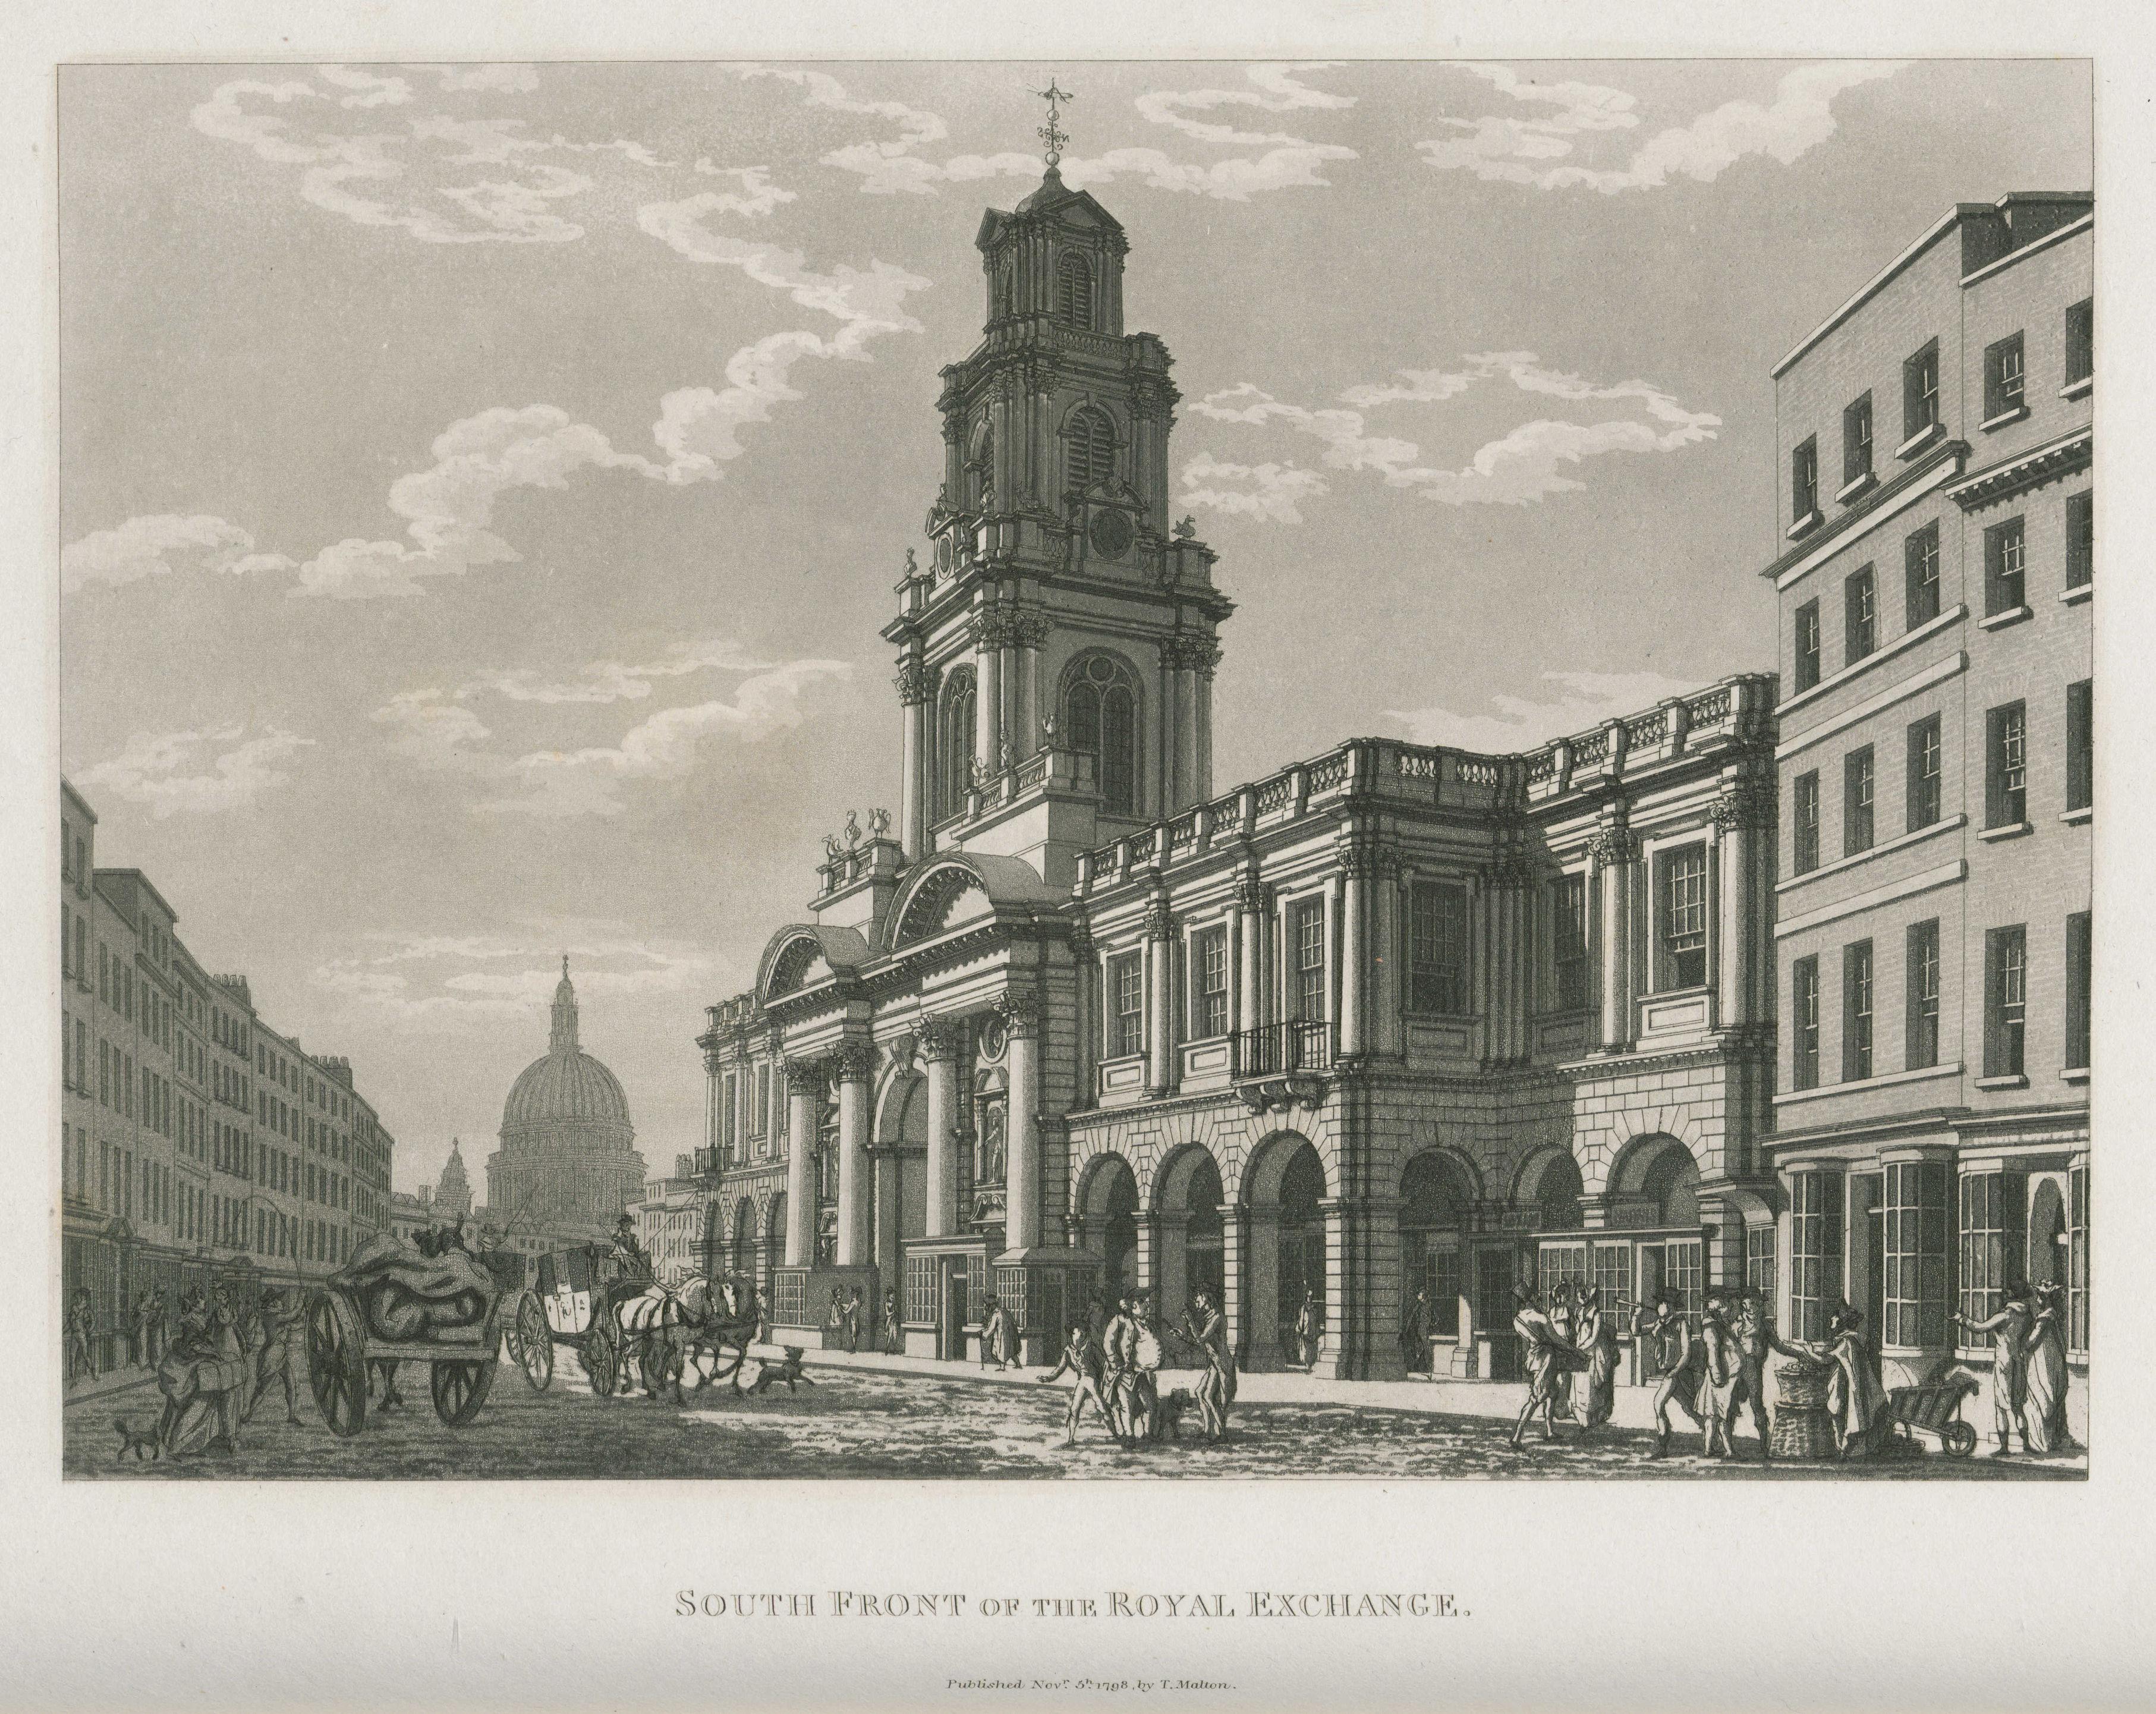 068 - Malton - South Front of the Royal Exchange